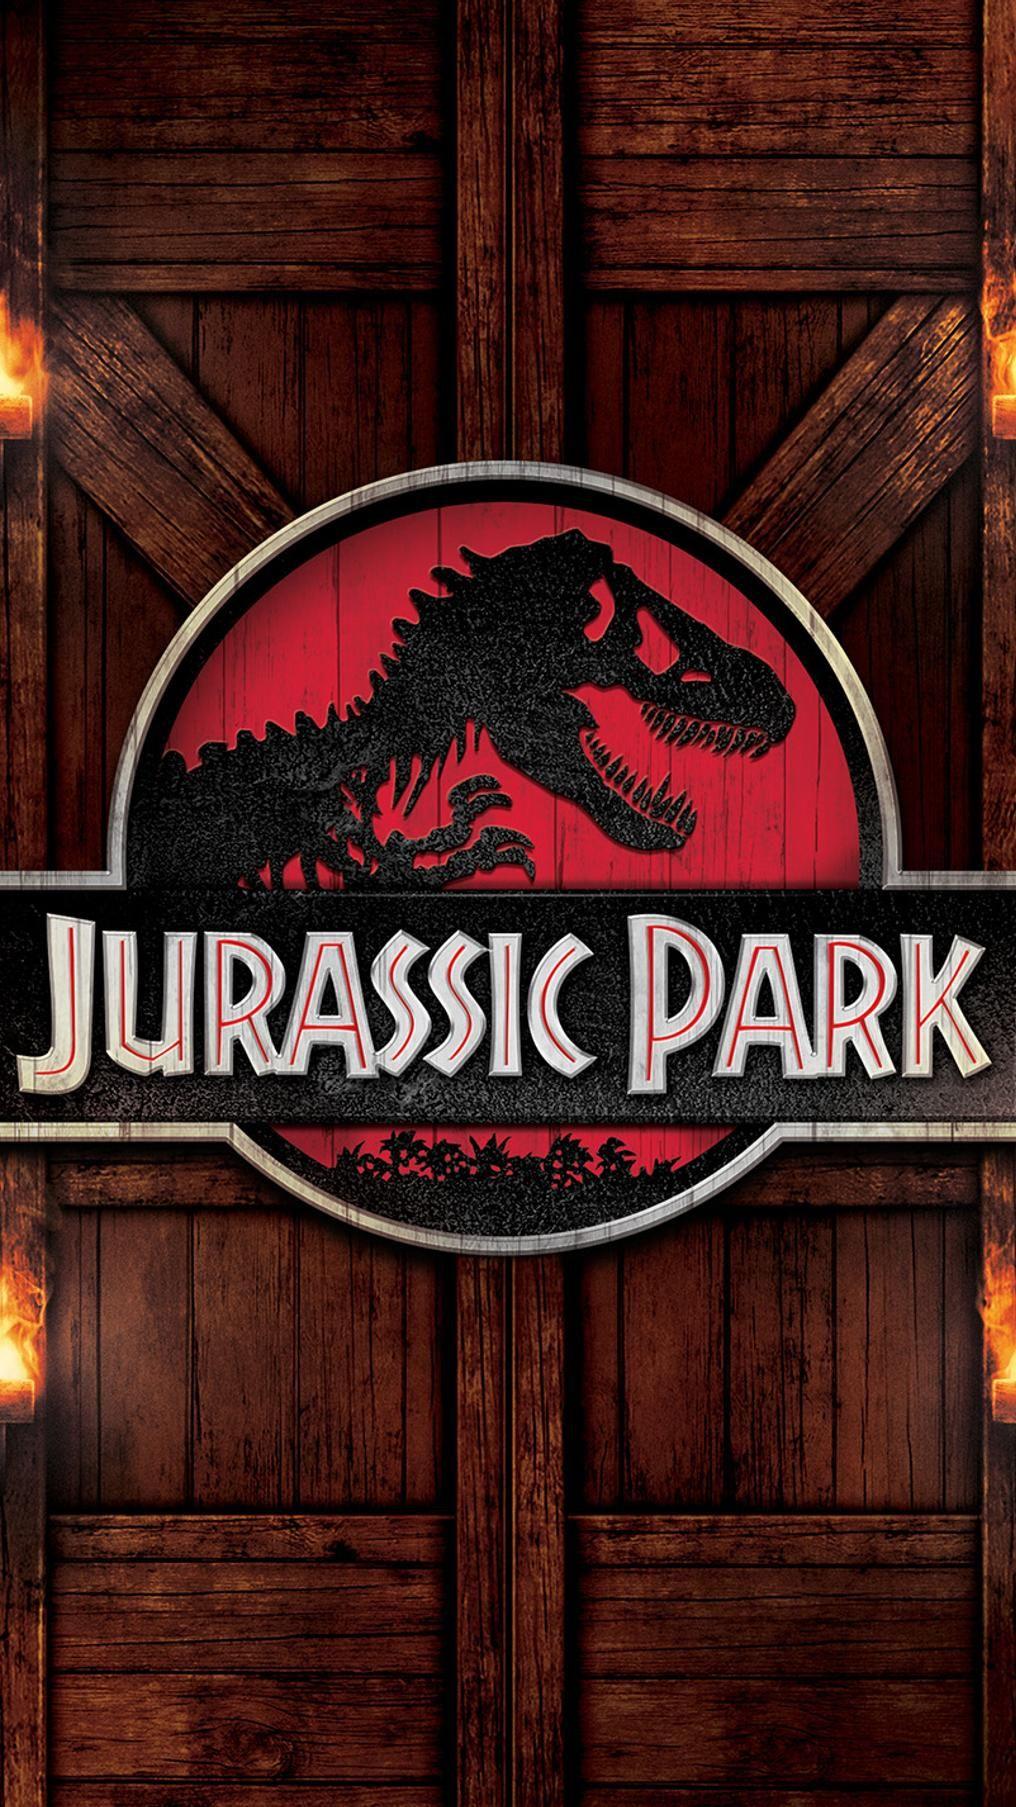 Jurassic Park (1993) Phone Wallpaper Jurassic park dvd